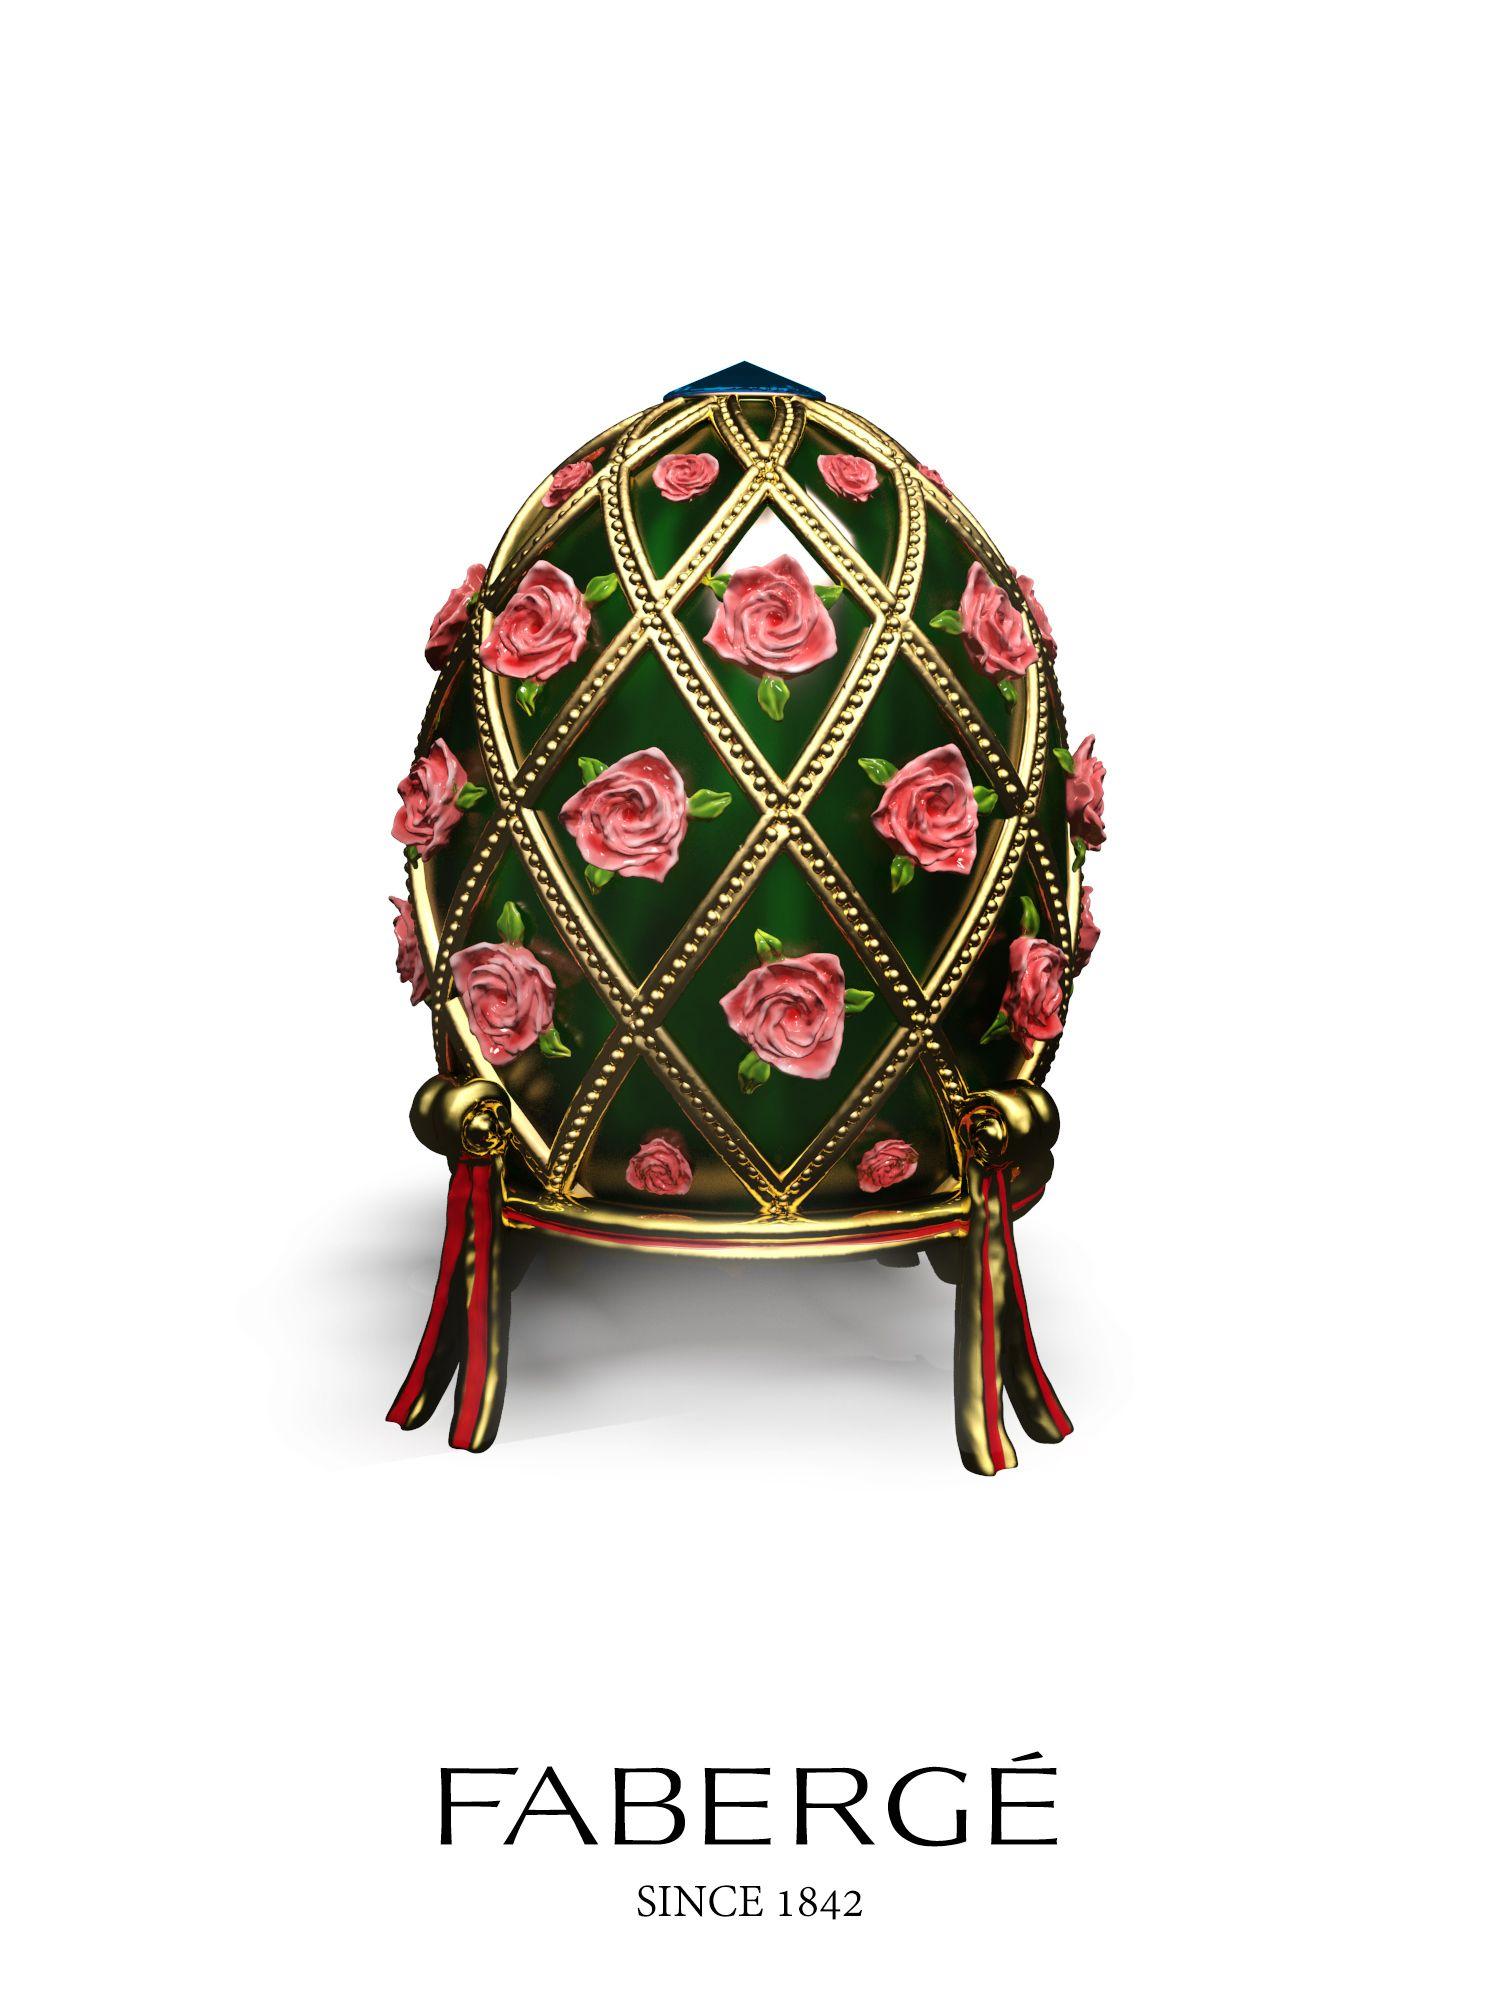 Faberge 3D model